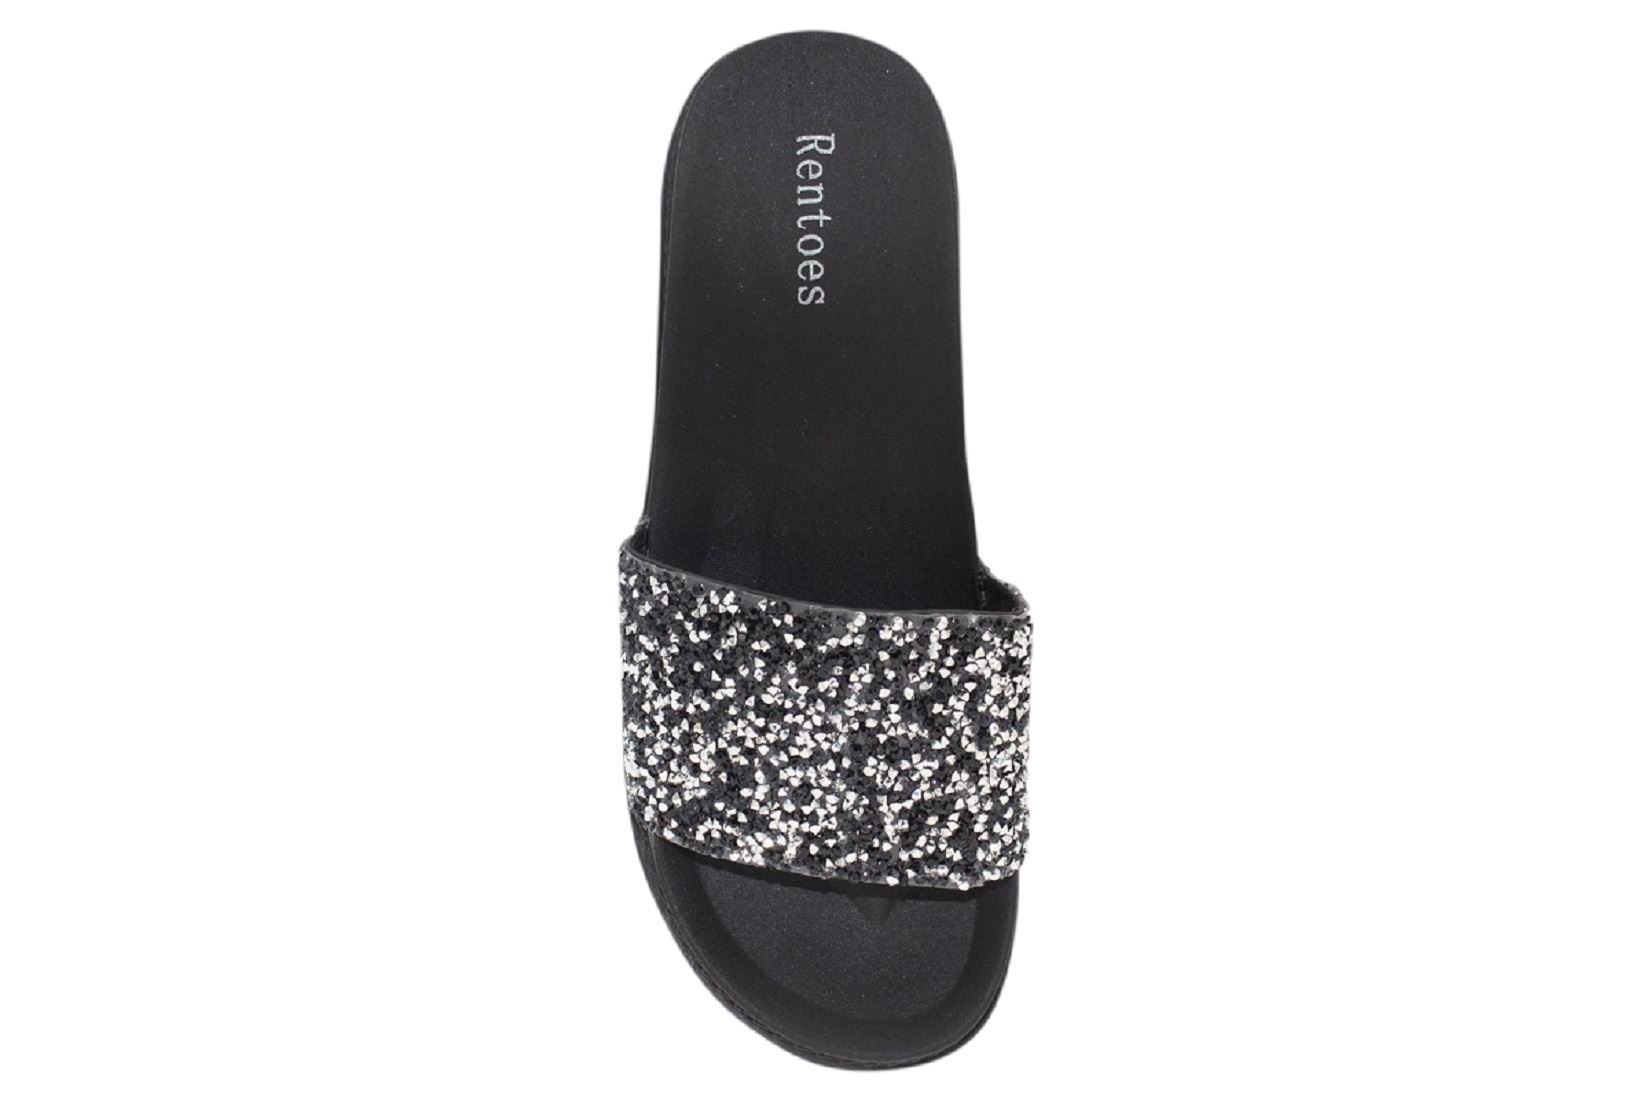 Womens-Sliders-Casual-Slippers-Mules-Ladies-Diamante-Flip-Flop-Sandals-Shoes thumbnail 65